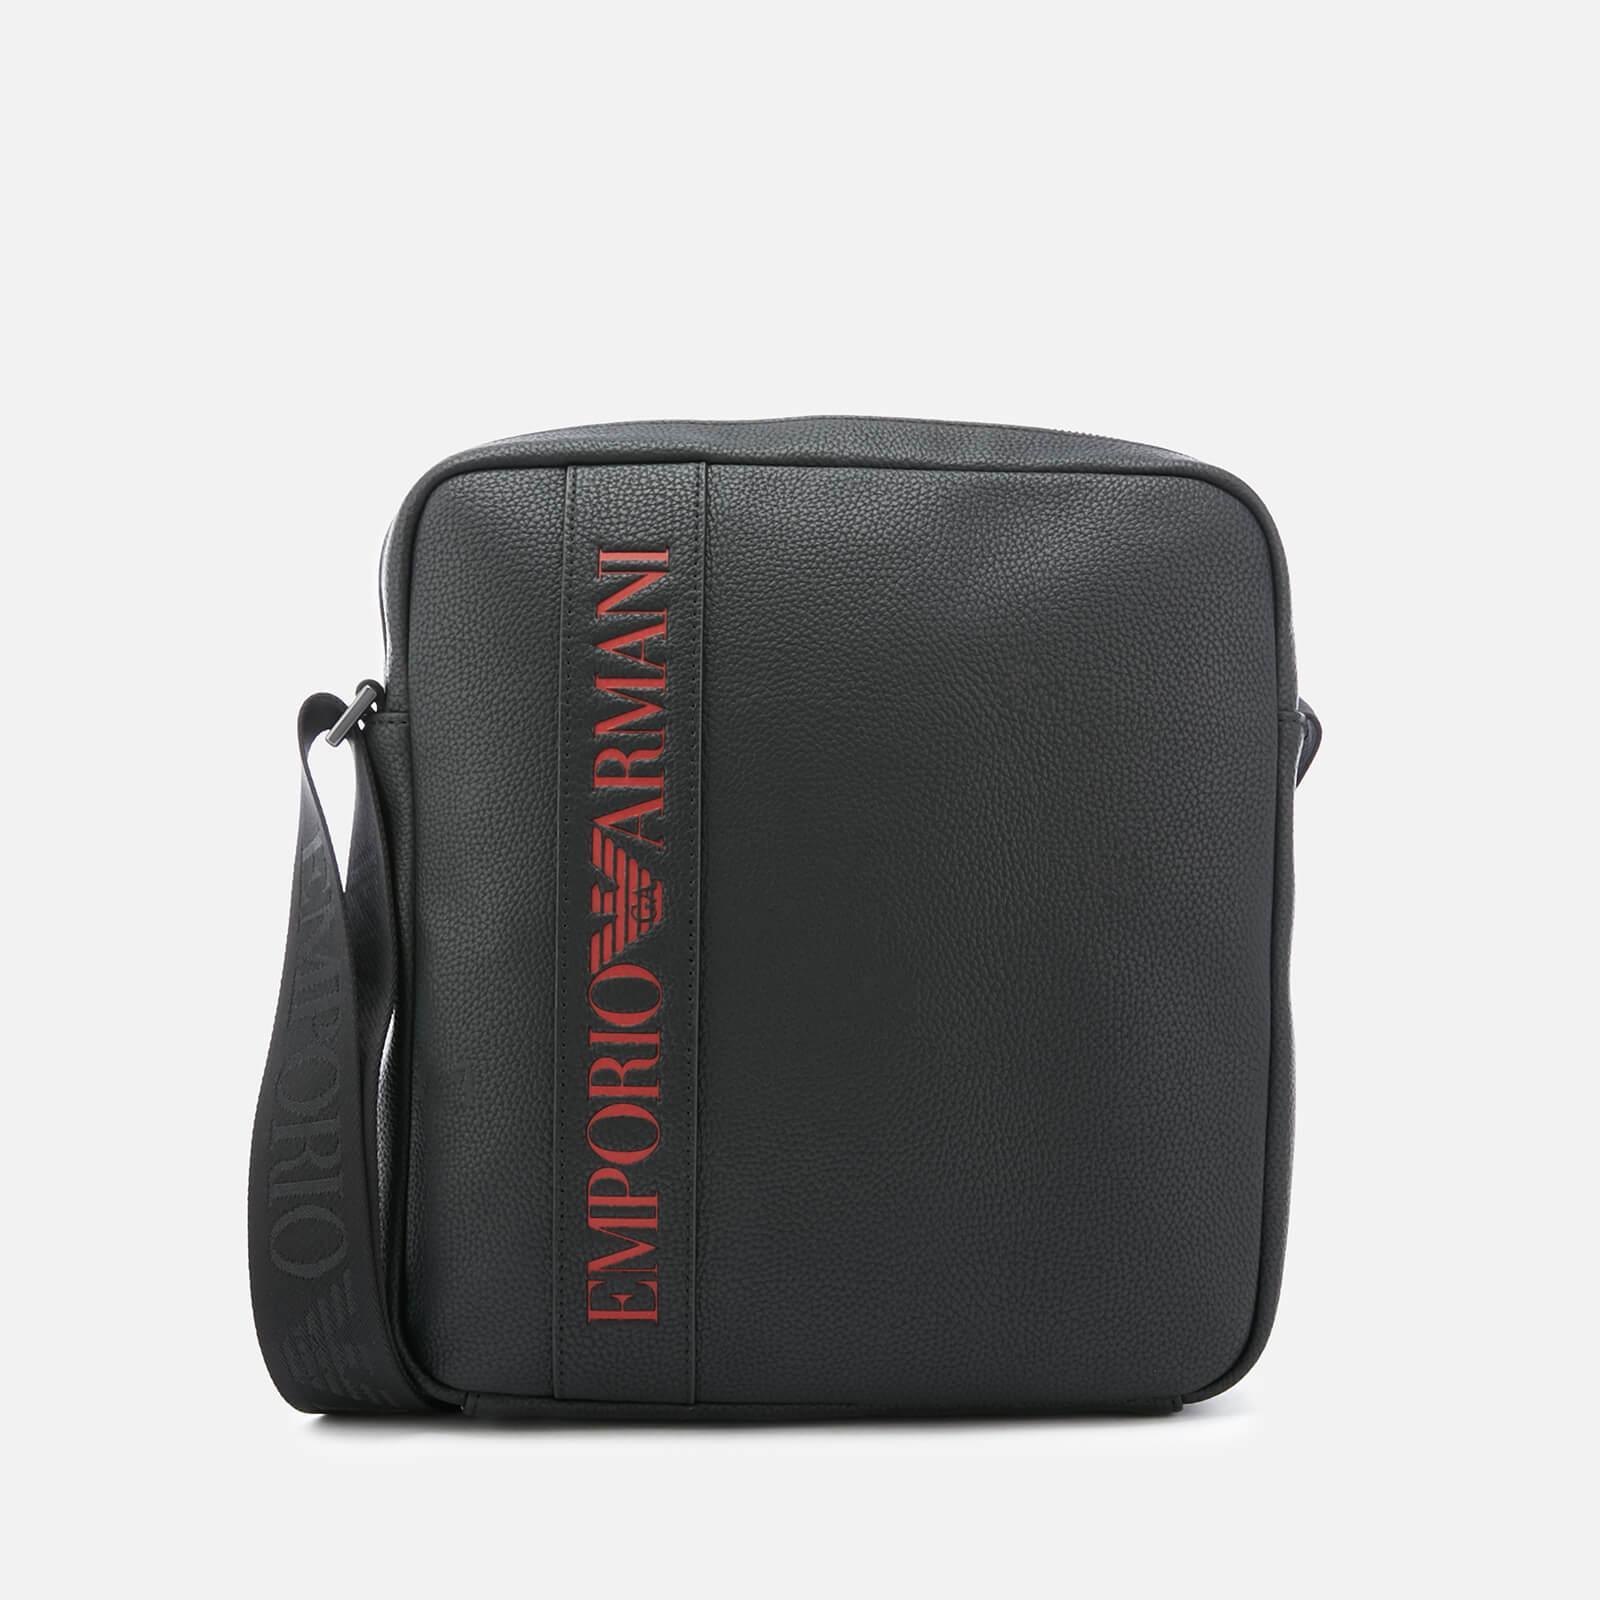 Lyst - Emporio Armani Cross Body Bag in Black for Men 5ed0b1649c358